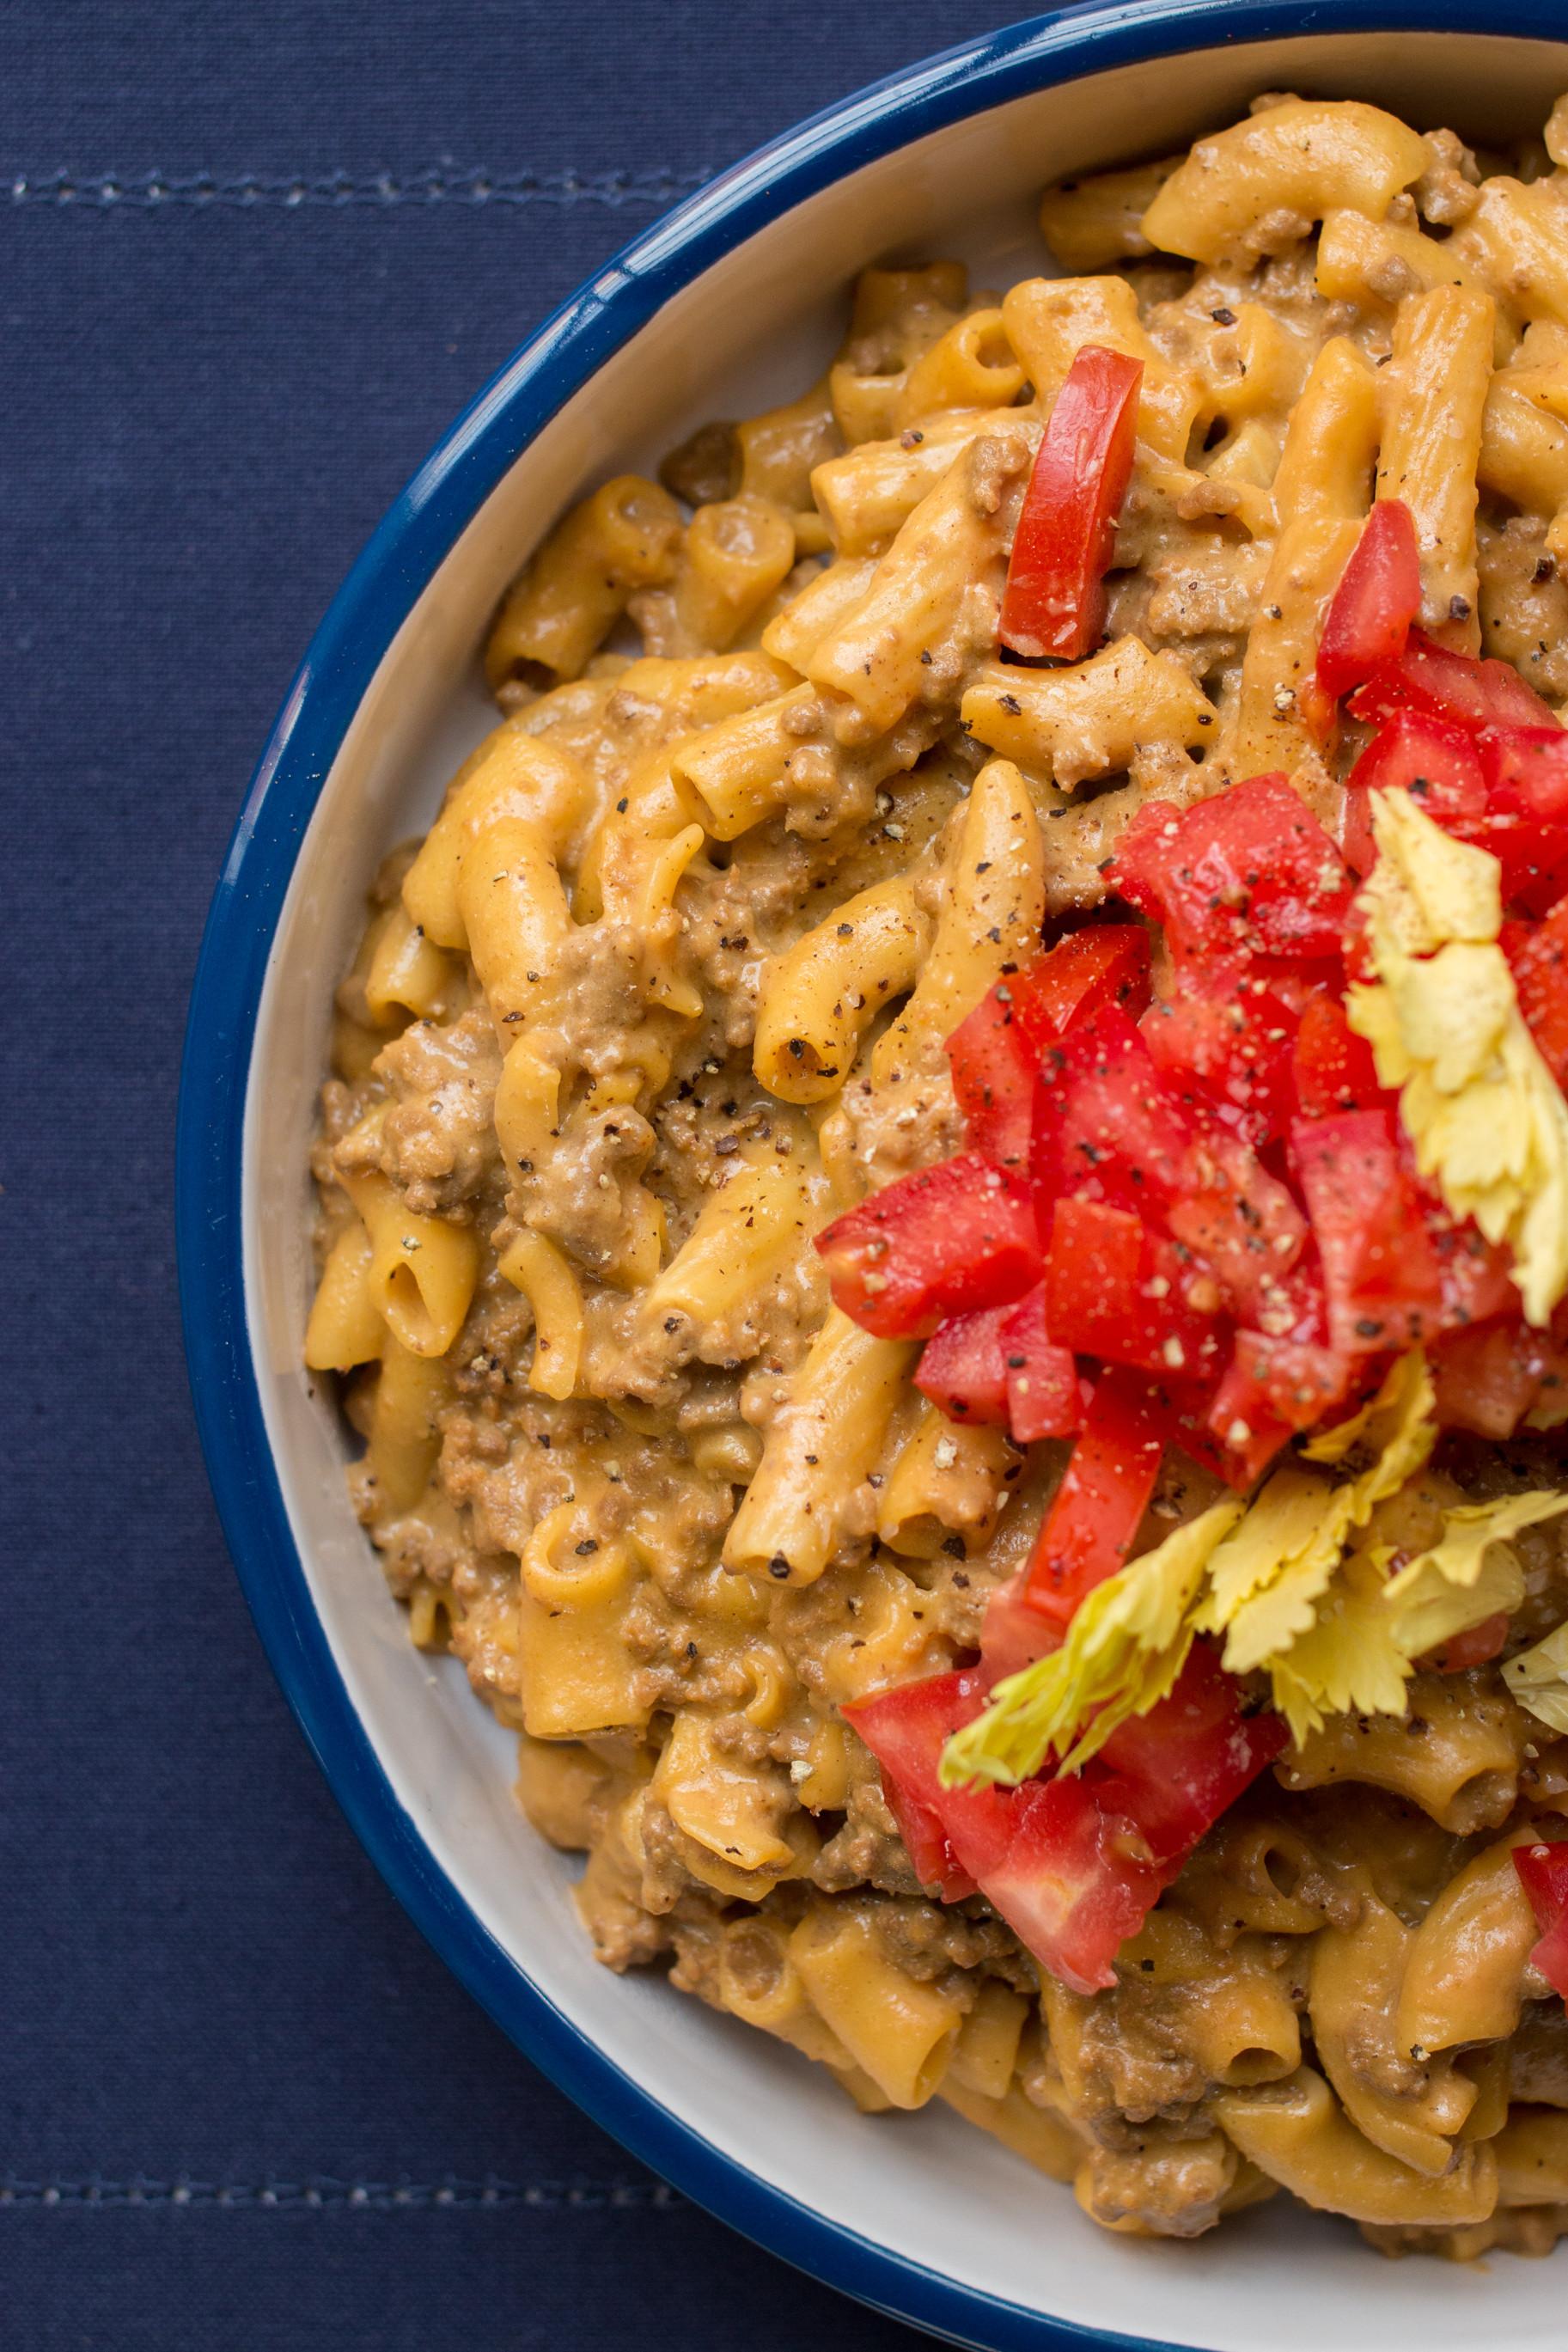 Healthy Easy Casseroles  60 Easy Healthy Casserole Recipes – Healthy Dinner